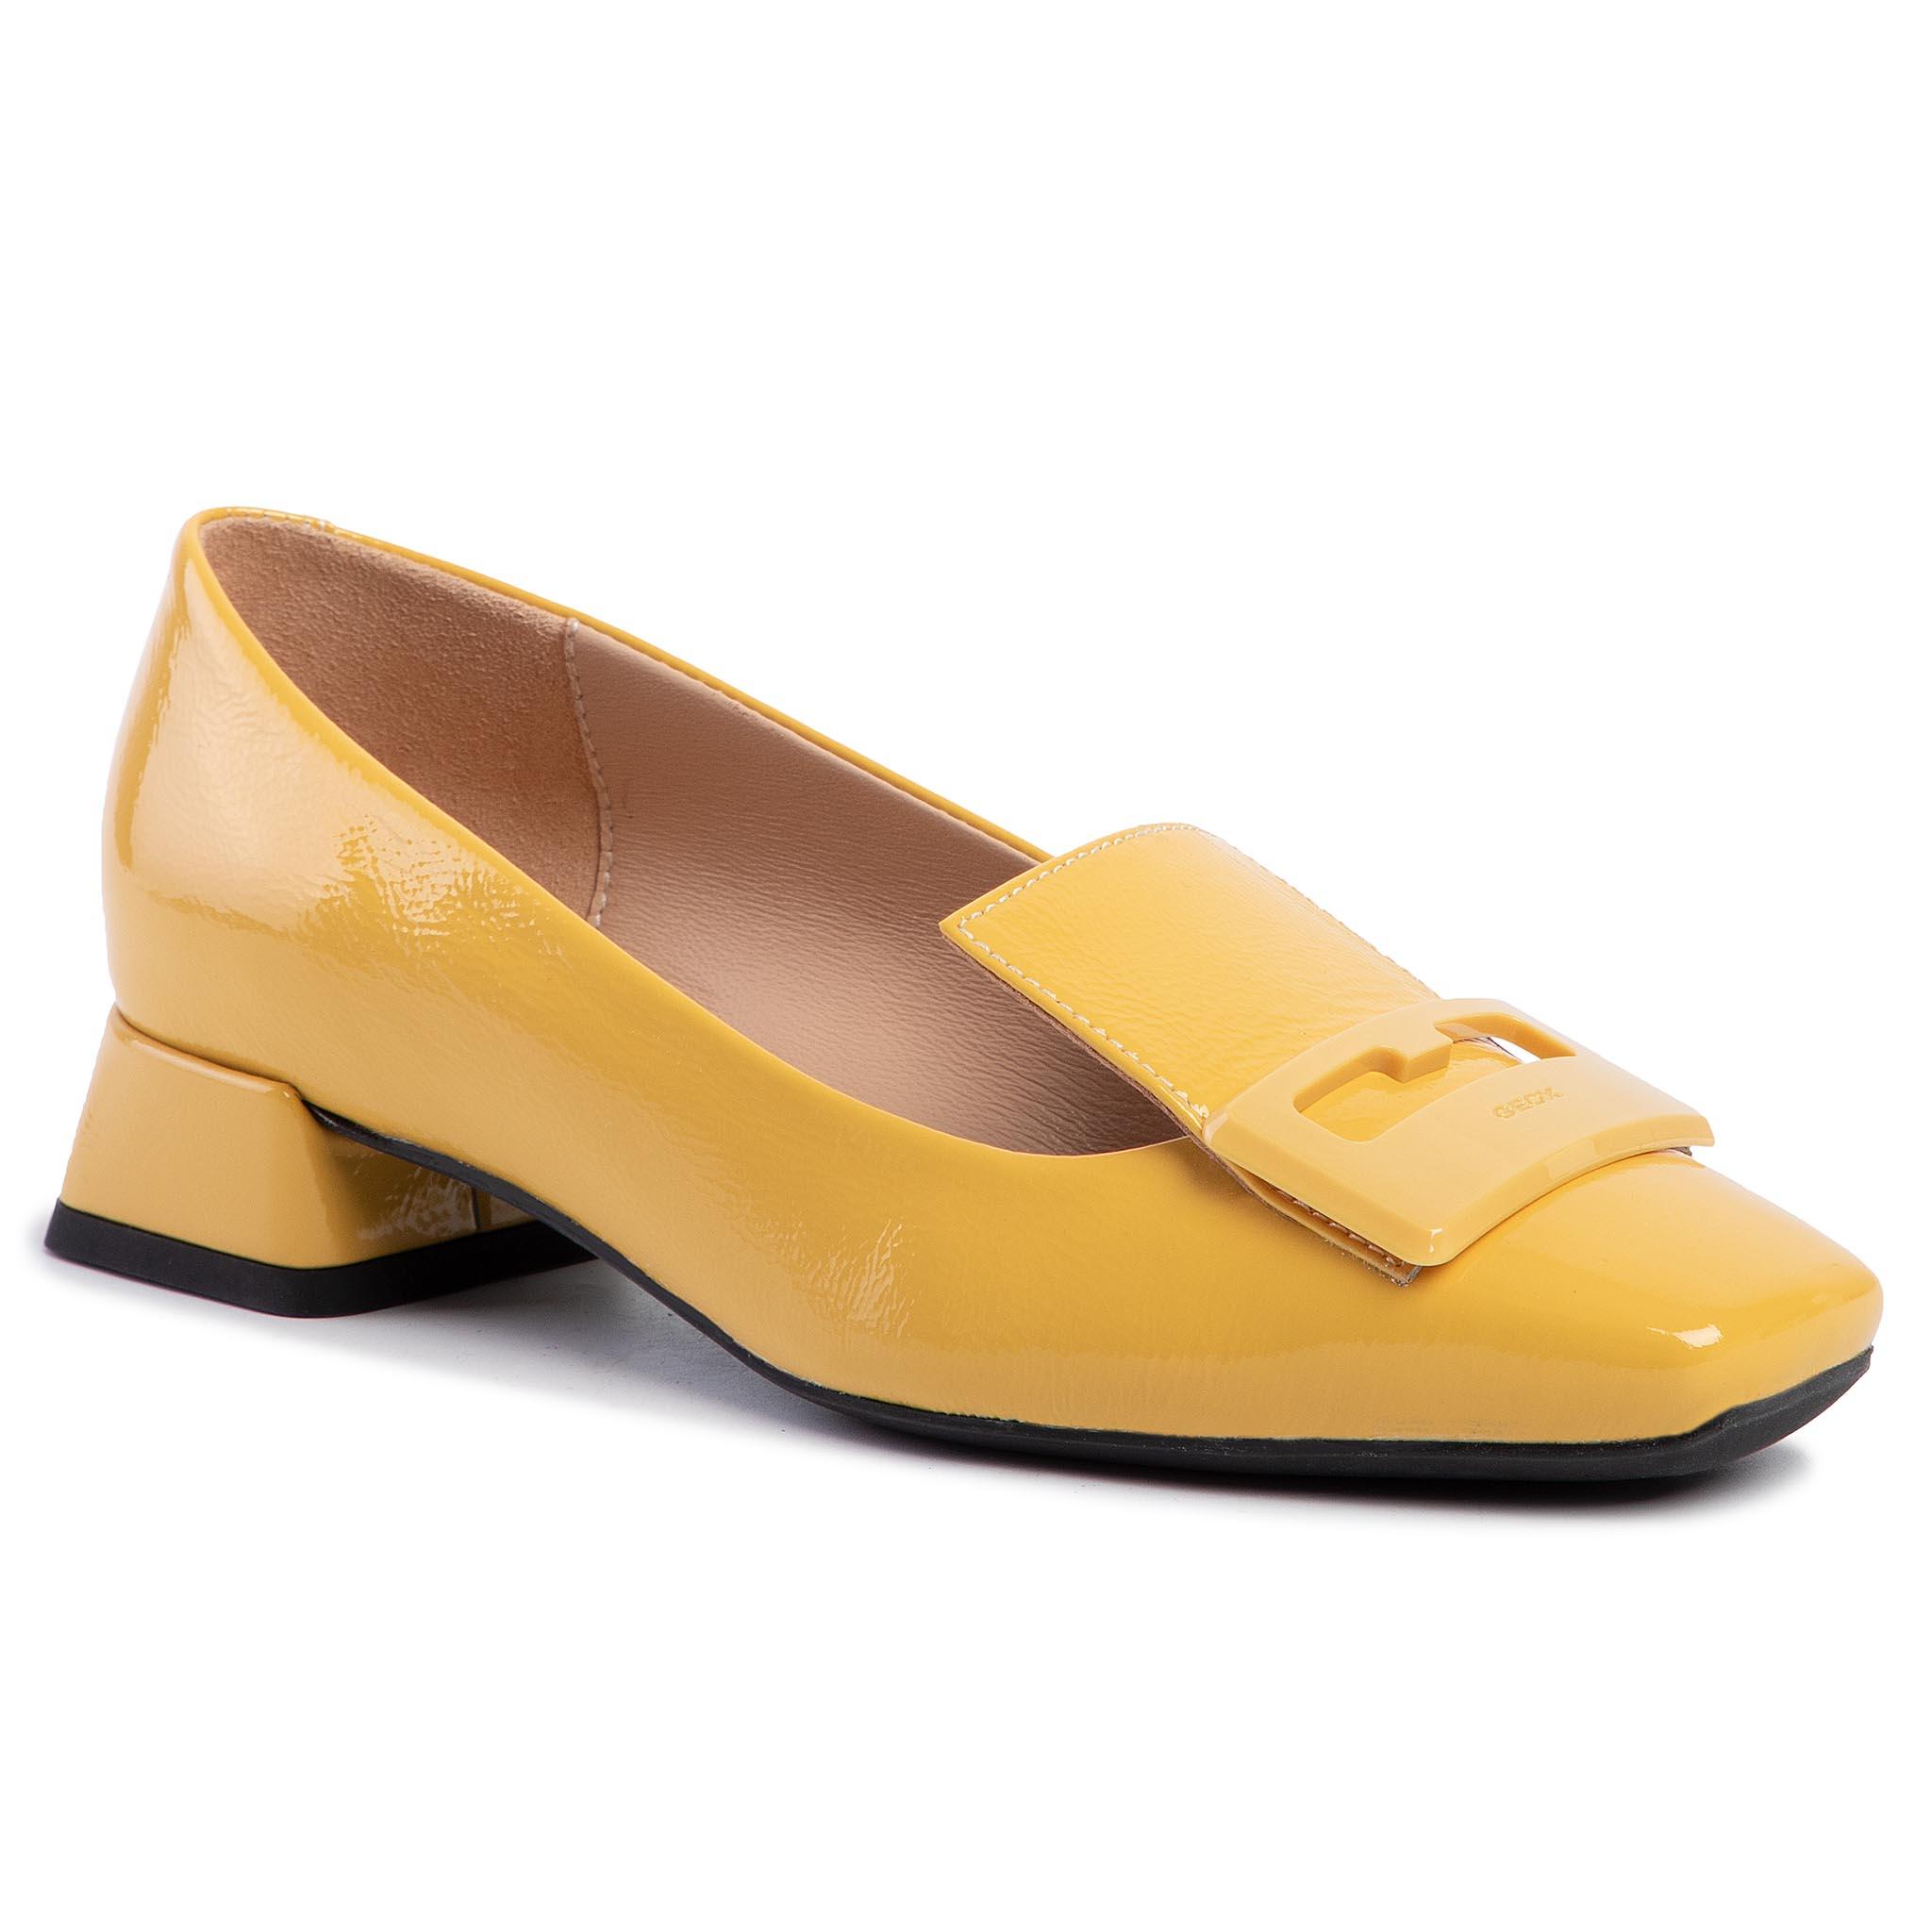 Shoes SERGIO BARDI SB 13 07 000258 207 Heels Low shoes